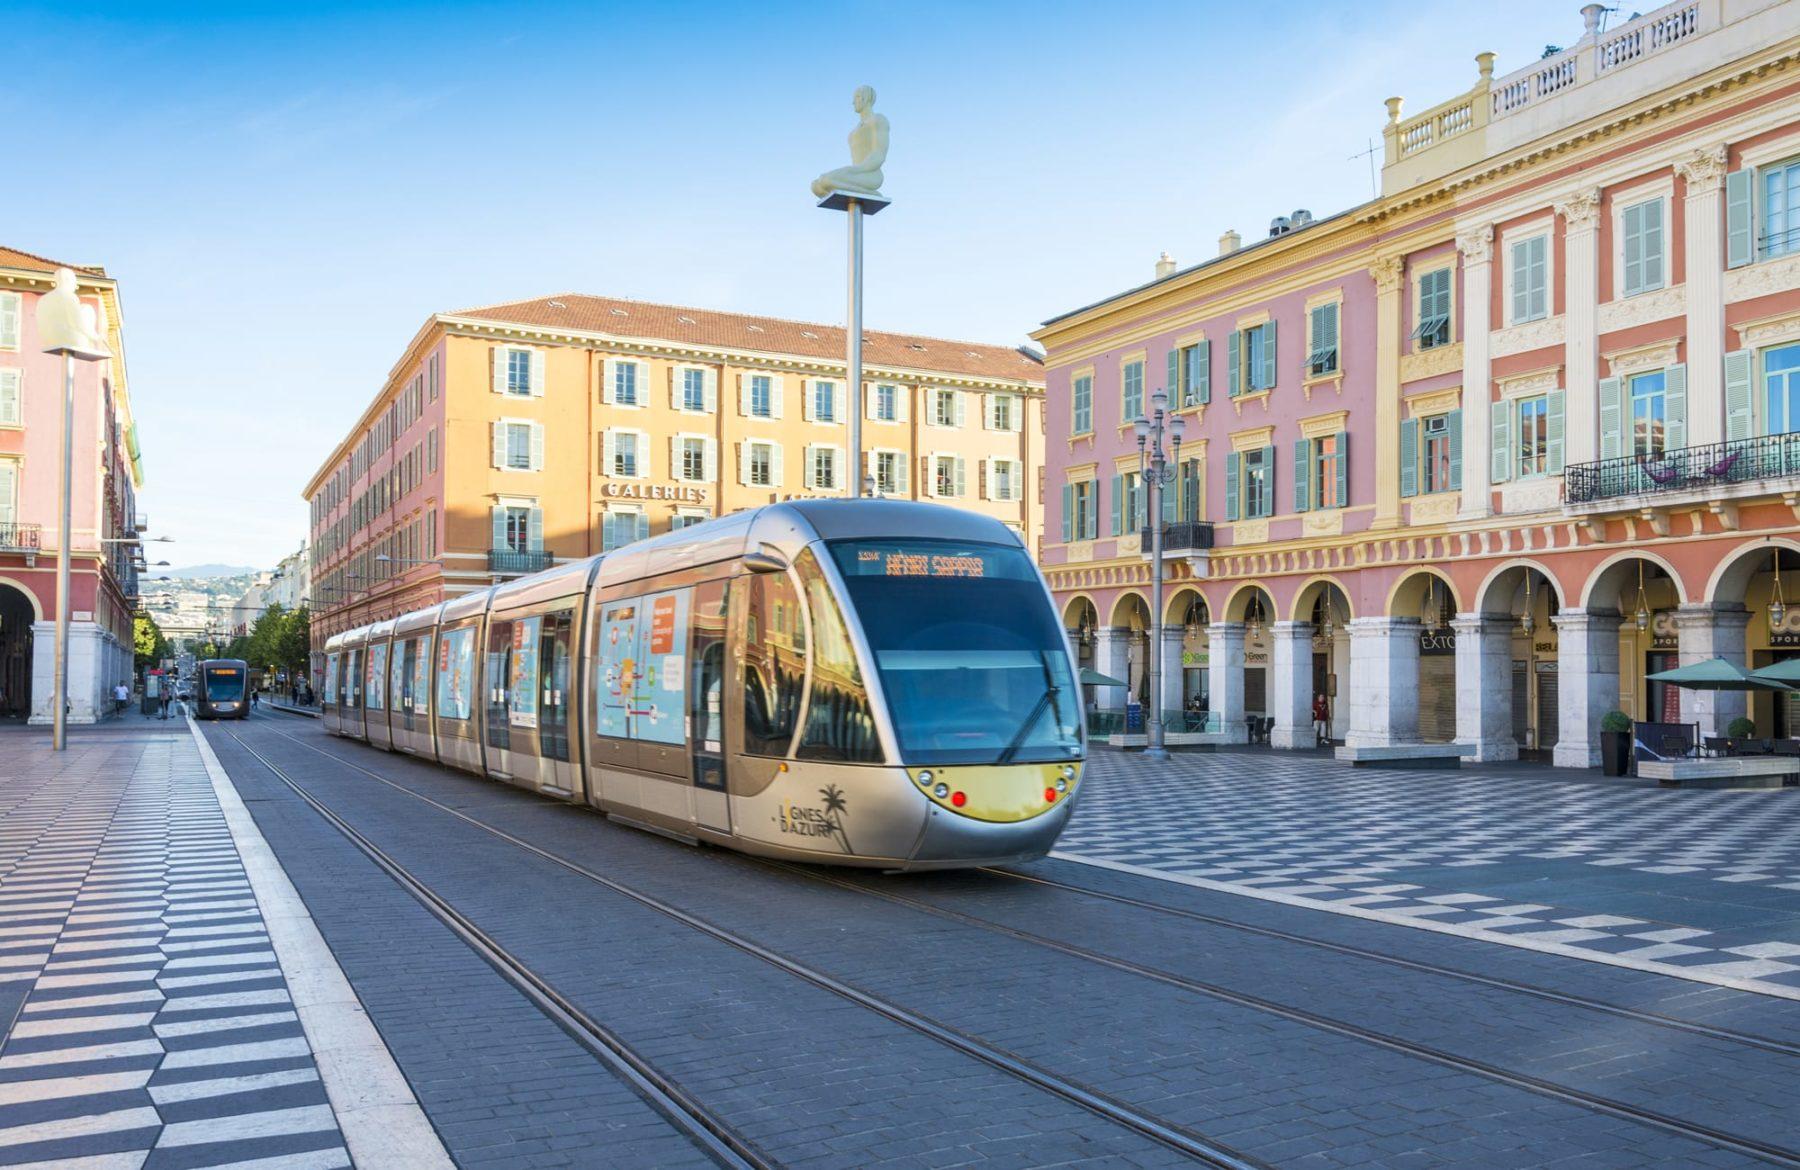 Straßenbahn Régie Lignes d'Azur